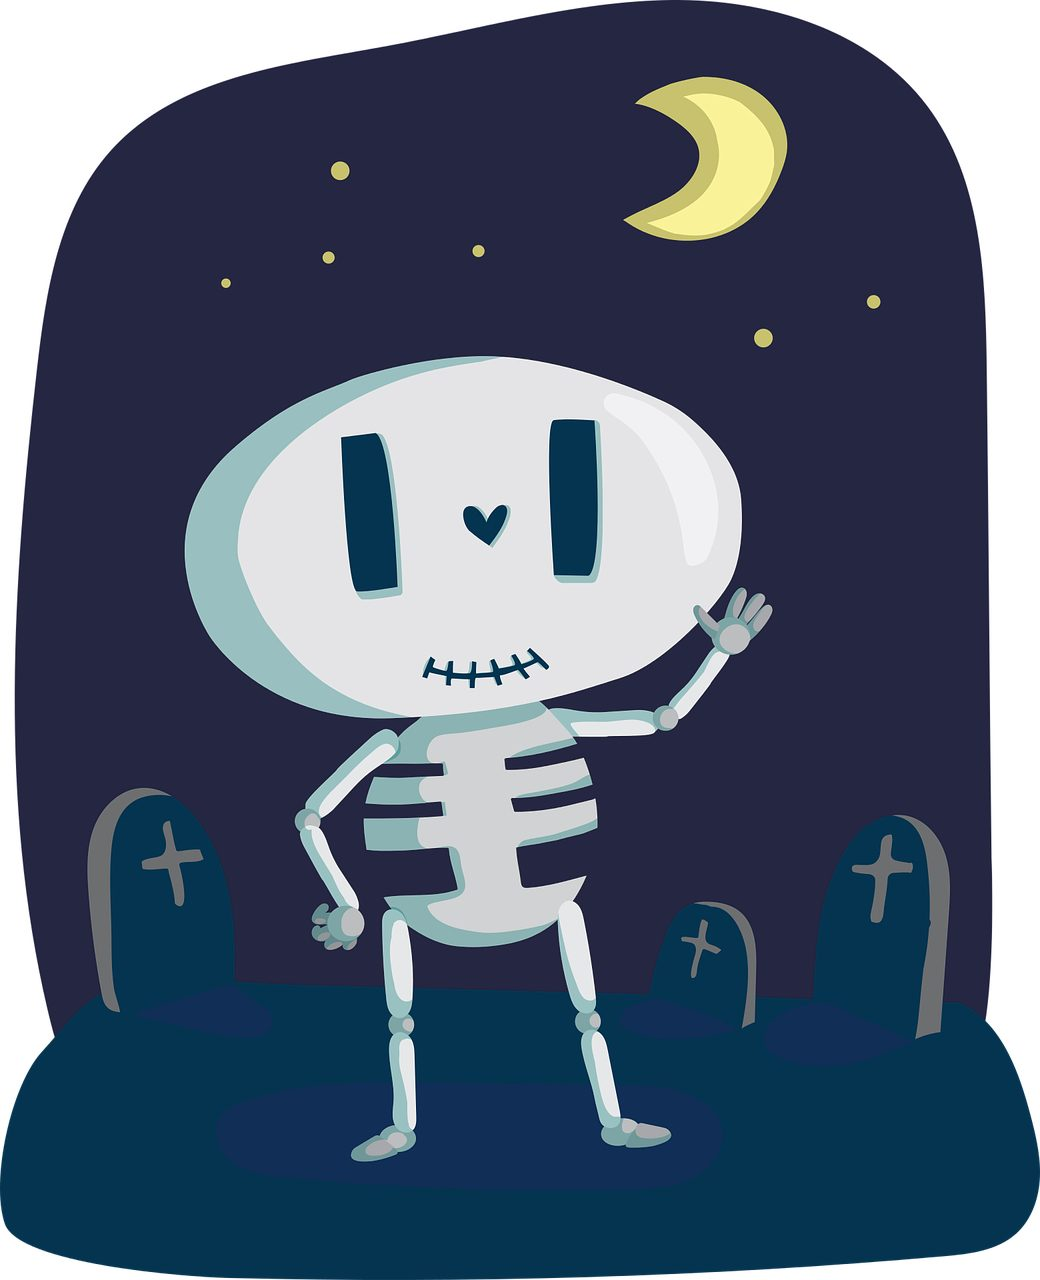 scheletro, Graves, Cimitero, Luna, ossa - Sfondi HD - Professor-falken.com